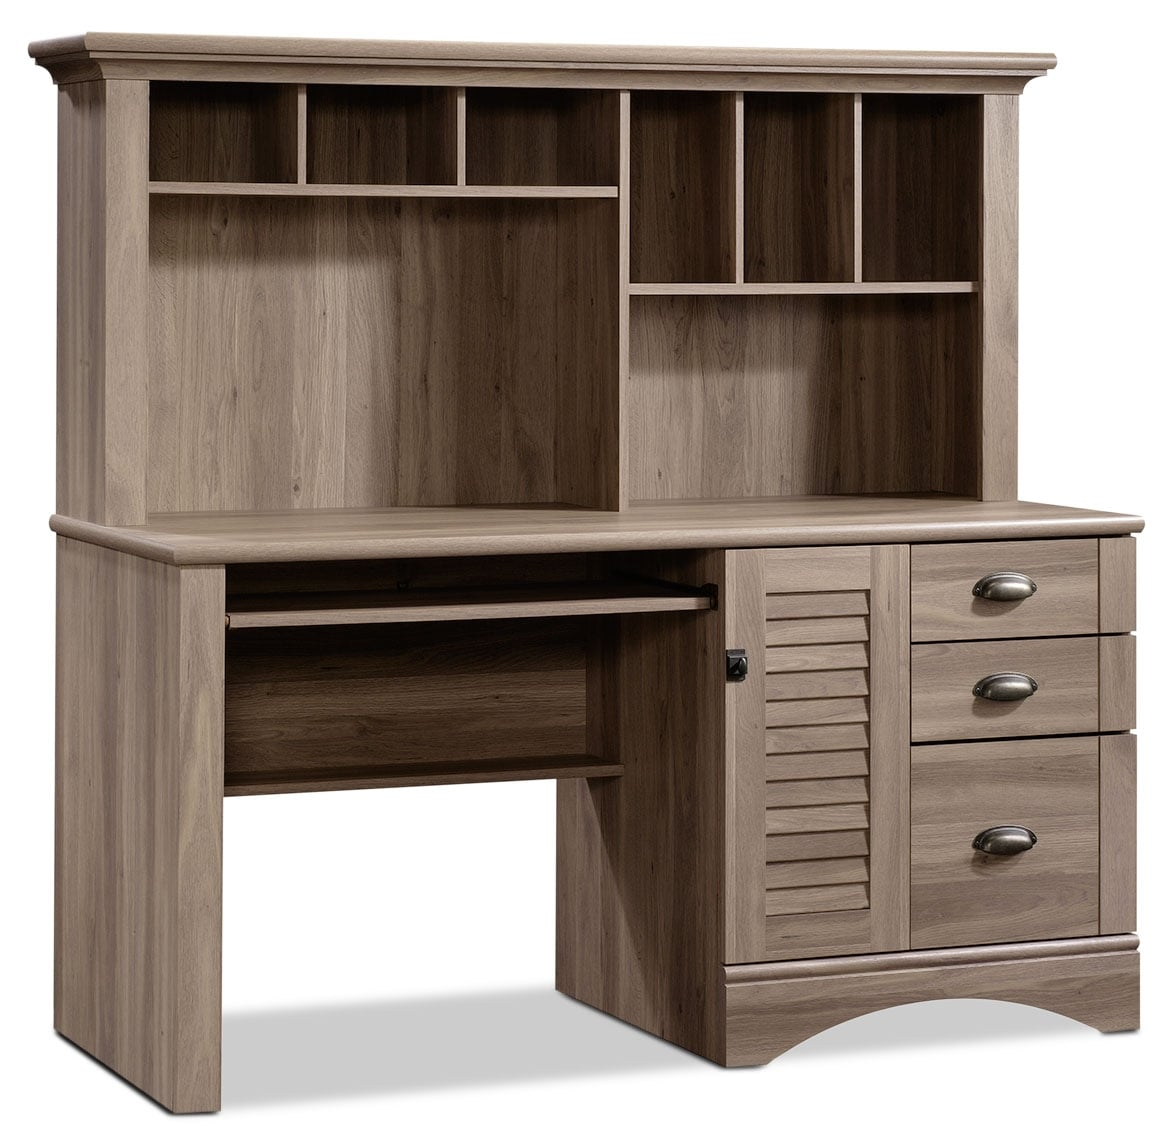 Brick Office Furniture ~ Harbor view desk with hutch salt oak the brick